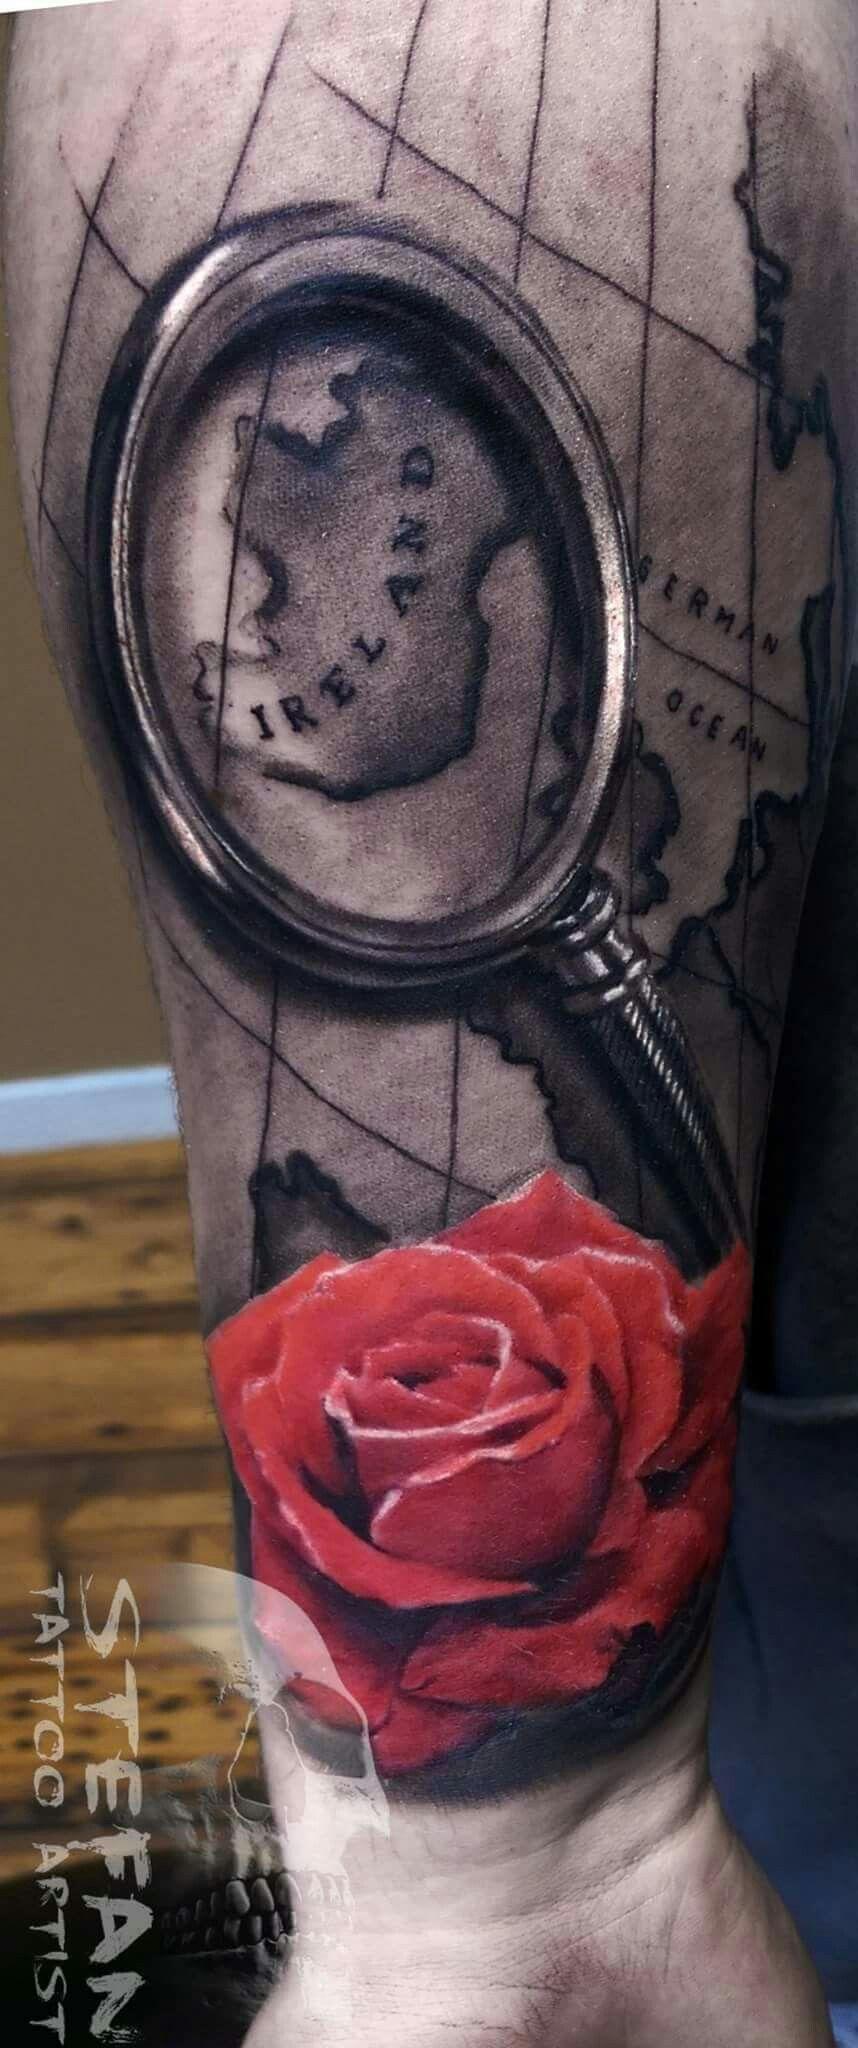 Body piercing map  Pin by Carlos Barros on Inspiração para tatuagens  Pinterest